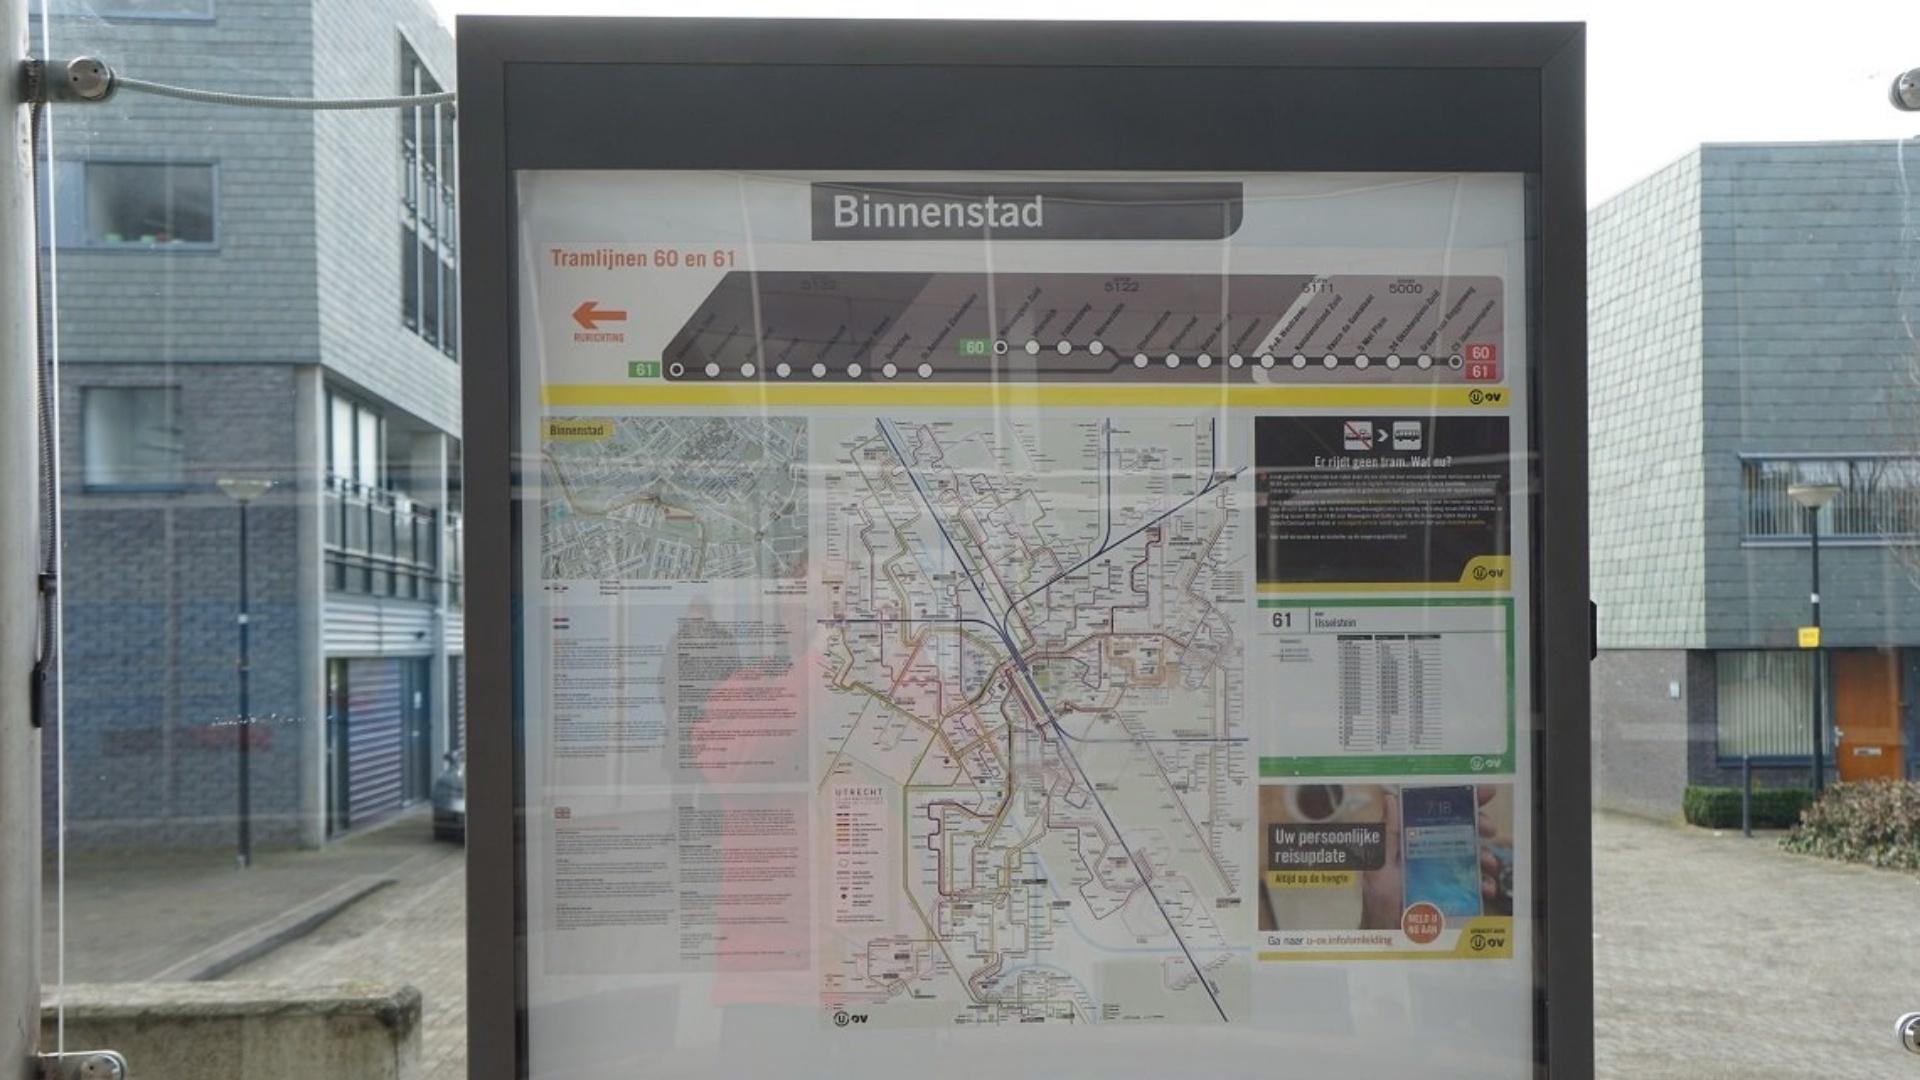 ramhalte binnenstad informatiebord